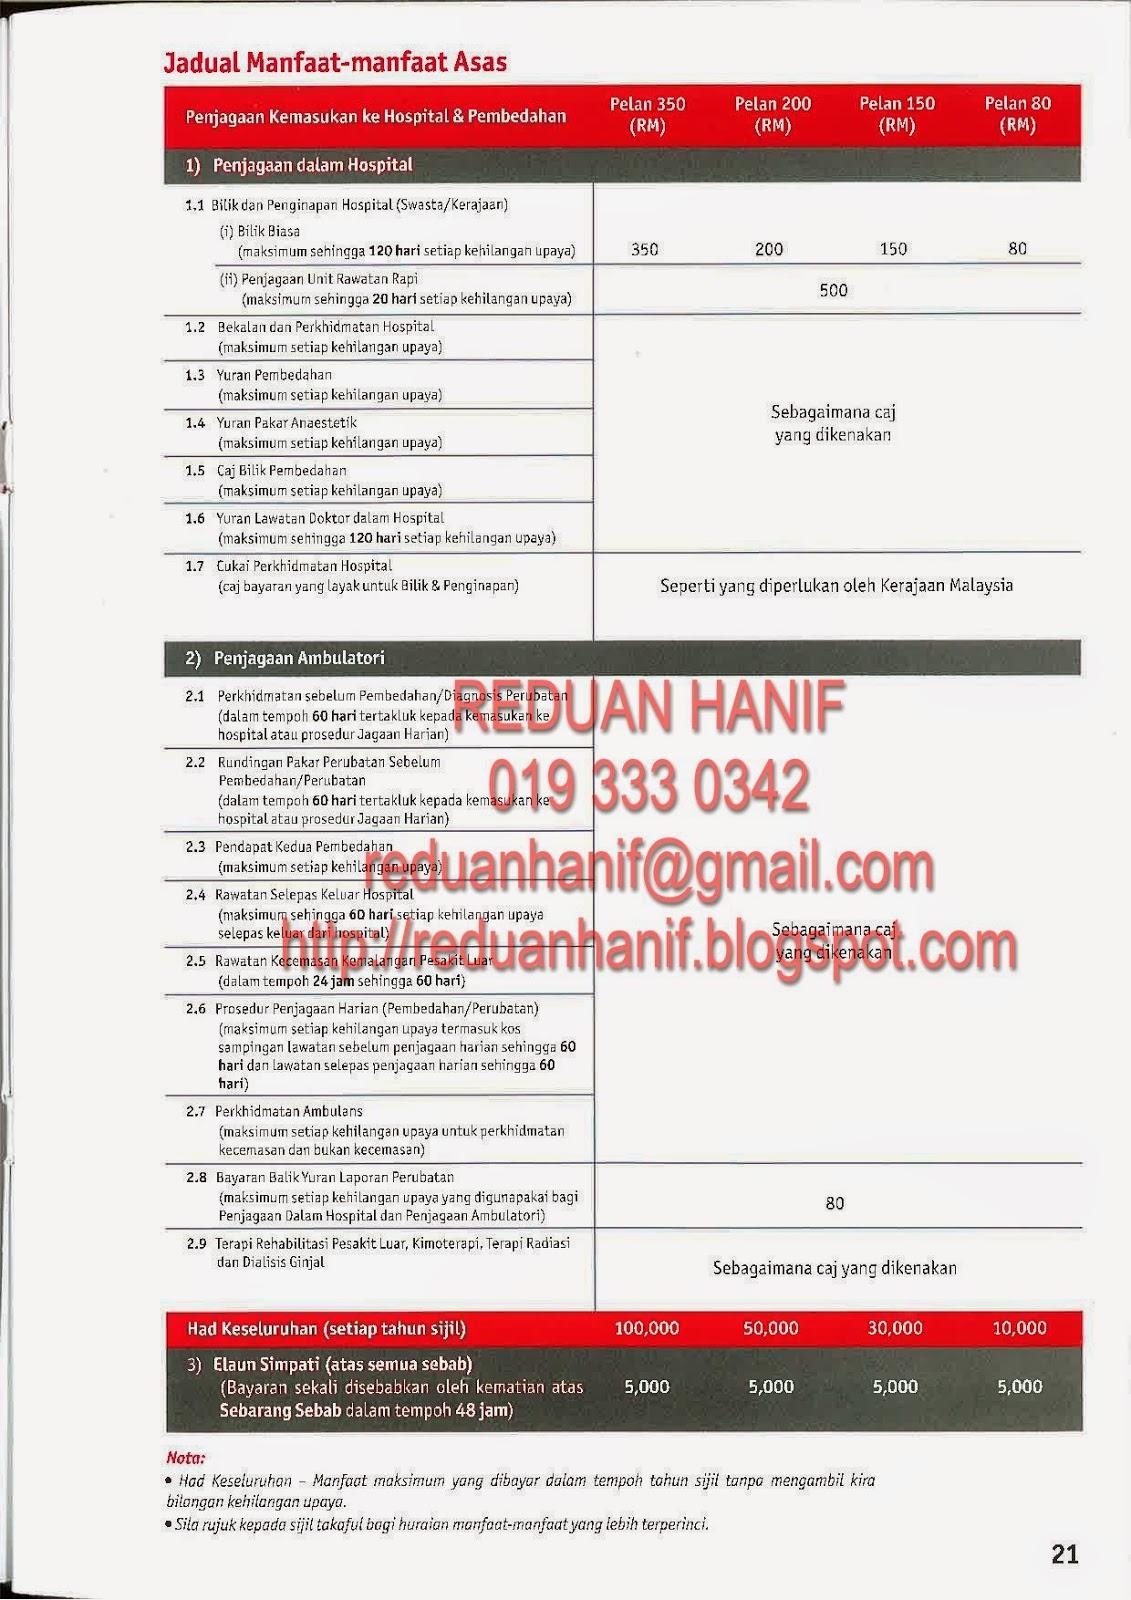 Faedah Employee Benefit AIA